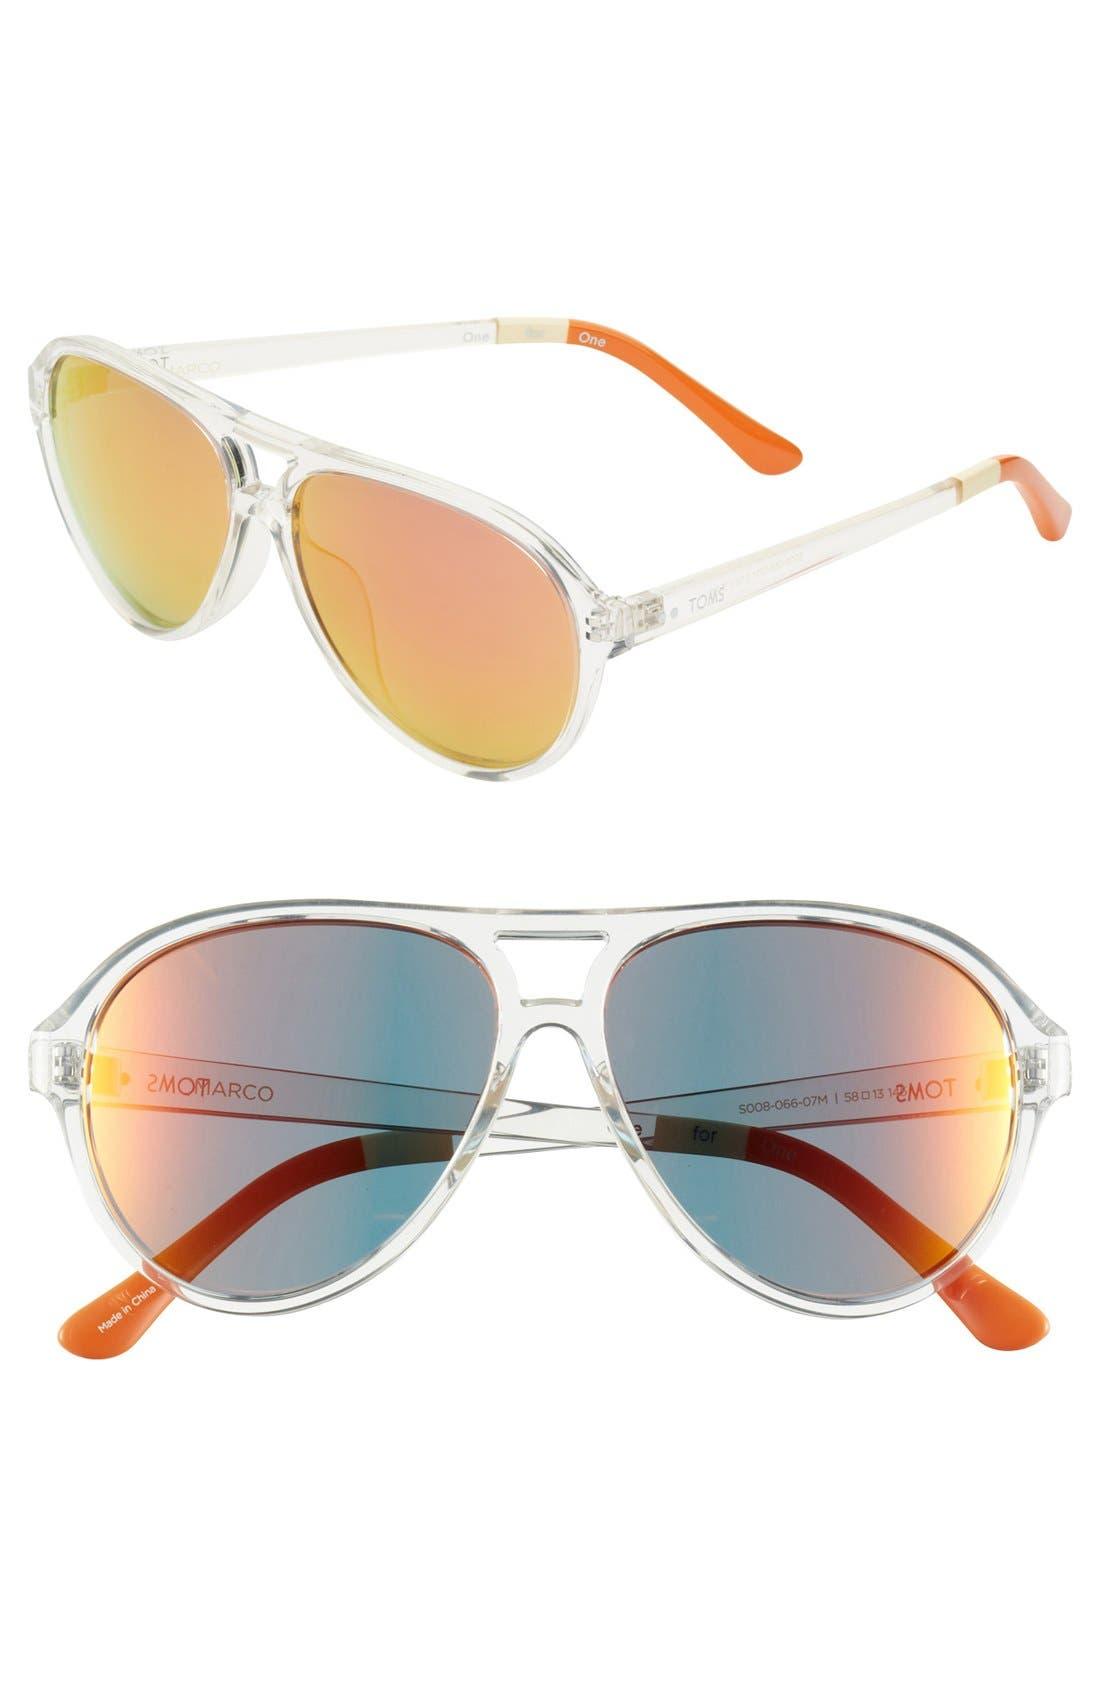 Alternate Image 1 Selected - TOMS 'Marco' 58mm Aviator Sunglasses